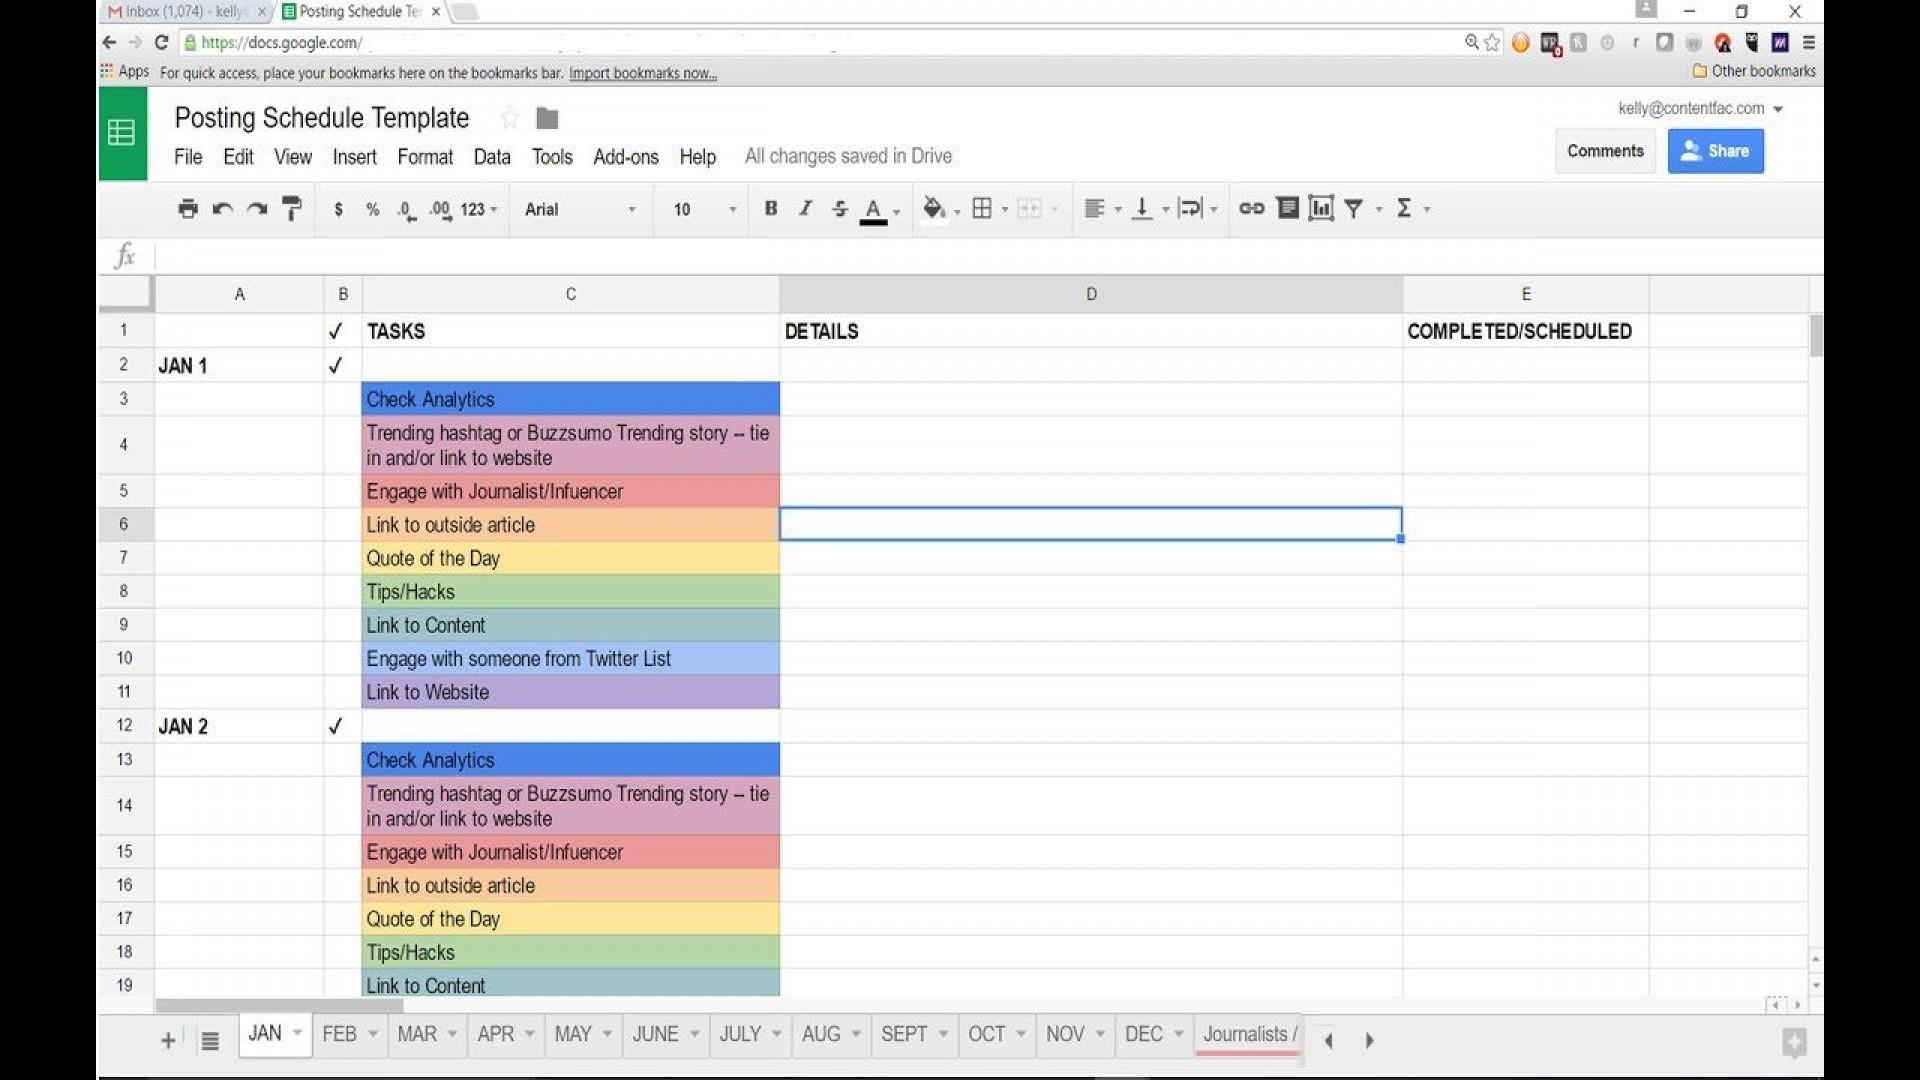 004 Top Social Media Editorial Calendar Template Image  Templates Content 2019 Planning 20201920